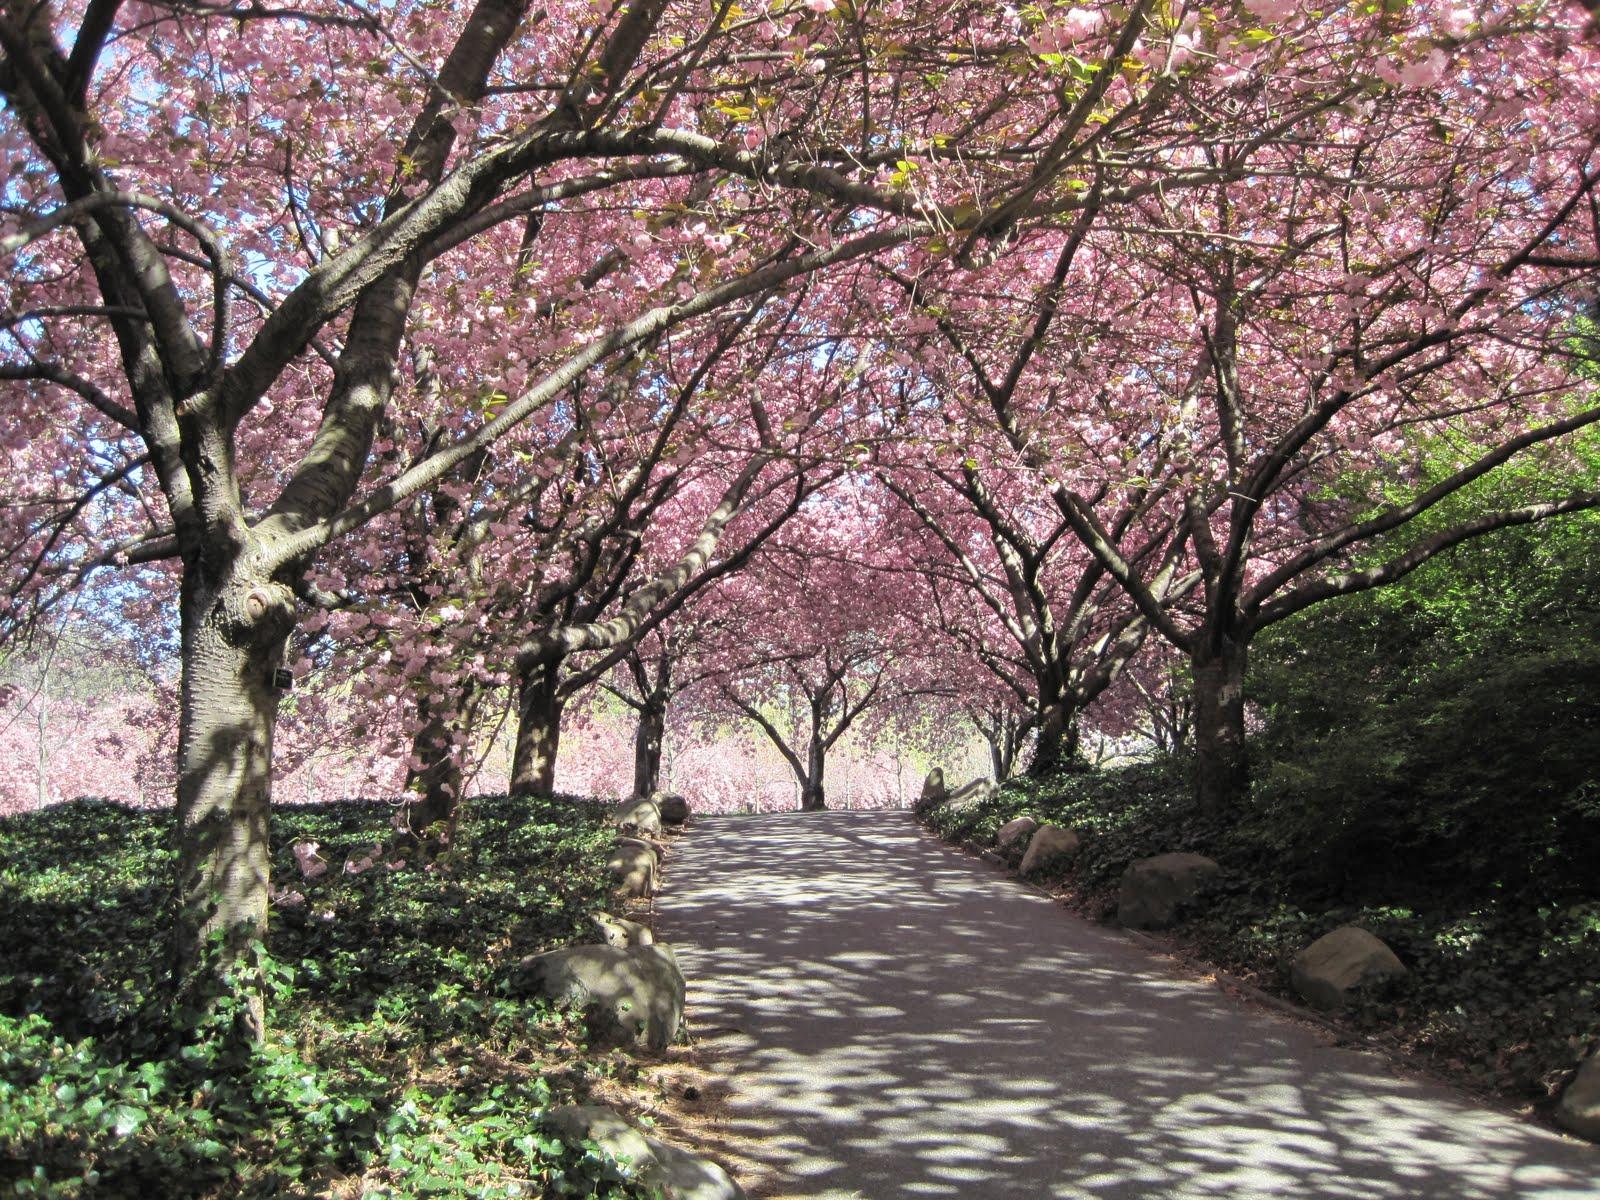 Greenbeat Brooklyn Scenes Of Spring At The Brooklyn Botanic Garden